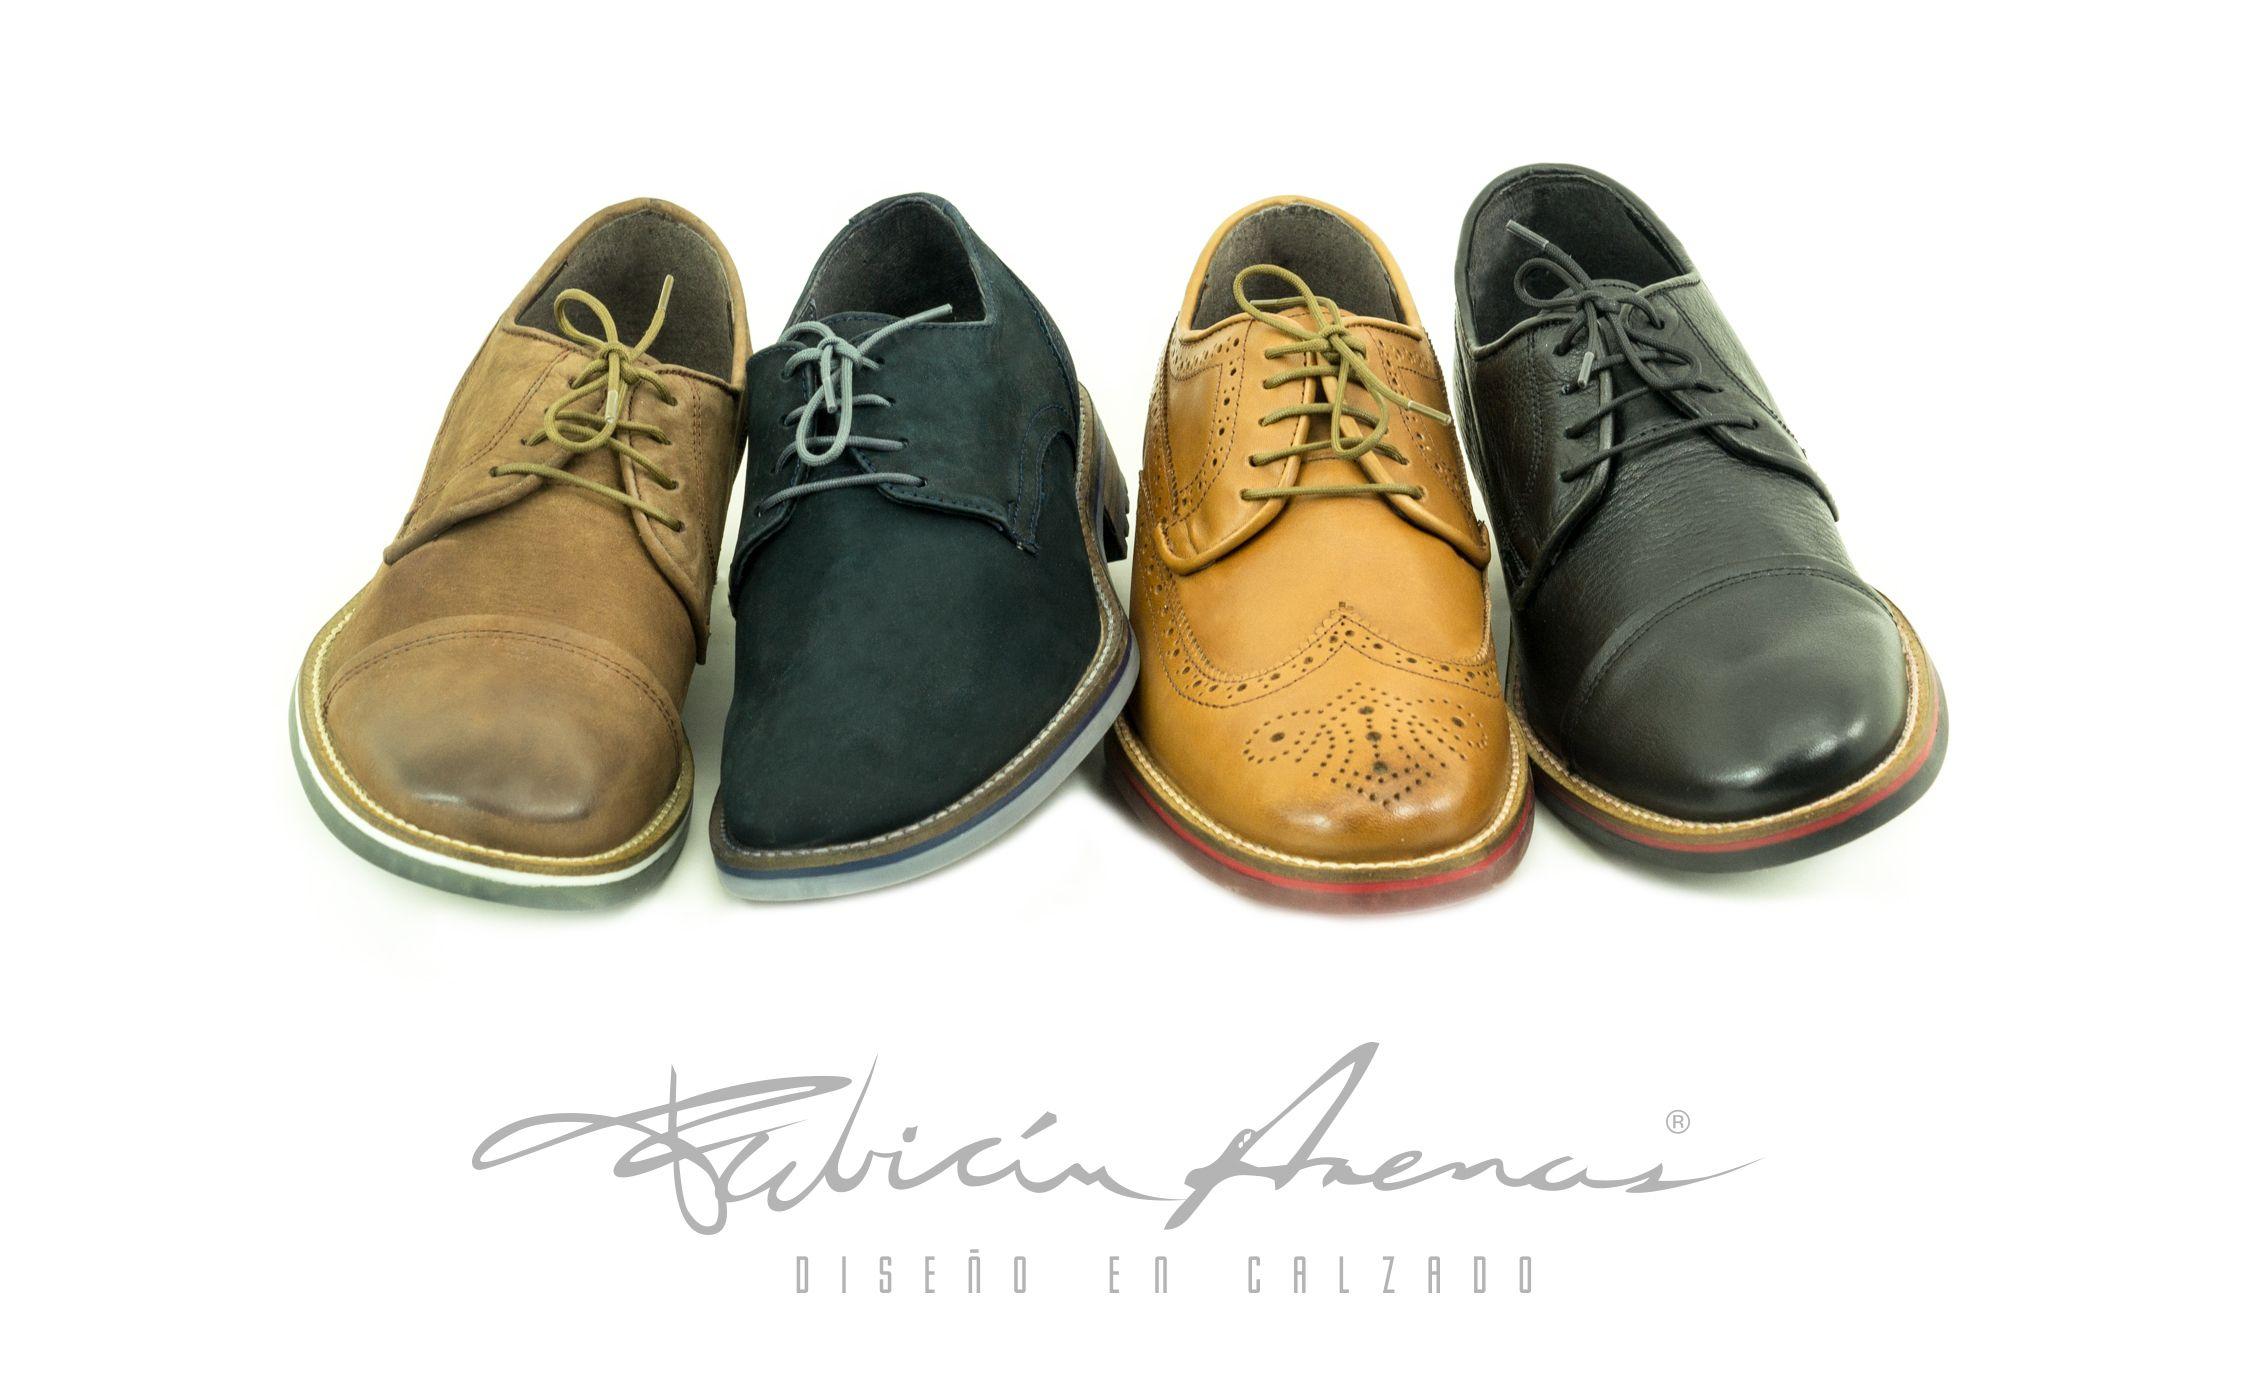 Fabian Arenas | Diseño en calzado www.fabianarenas.com.mx @Fabian Arenas  #FabianArenas #HechoenMexico #shoes #zapatos #calzado #mens #men #hombres  #hombre ...